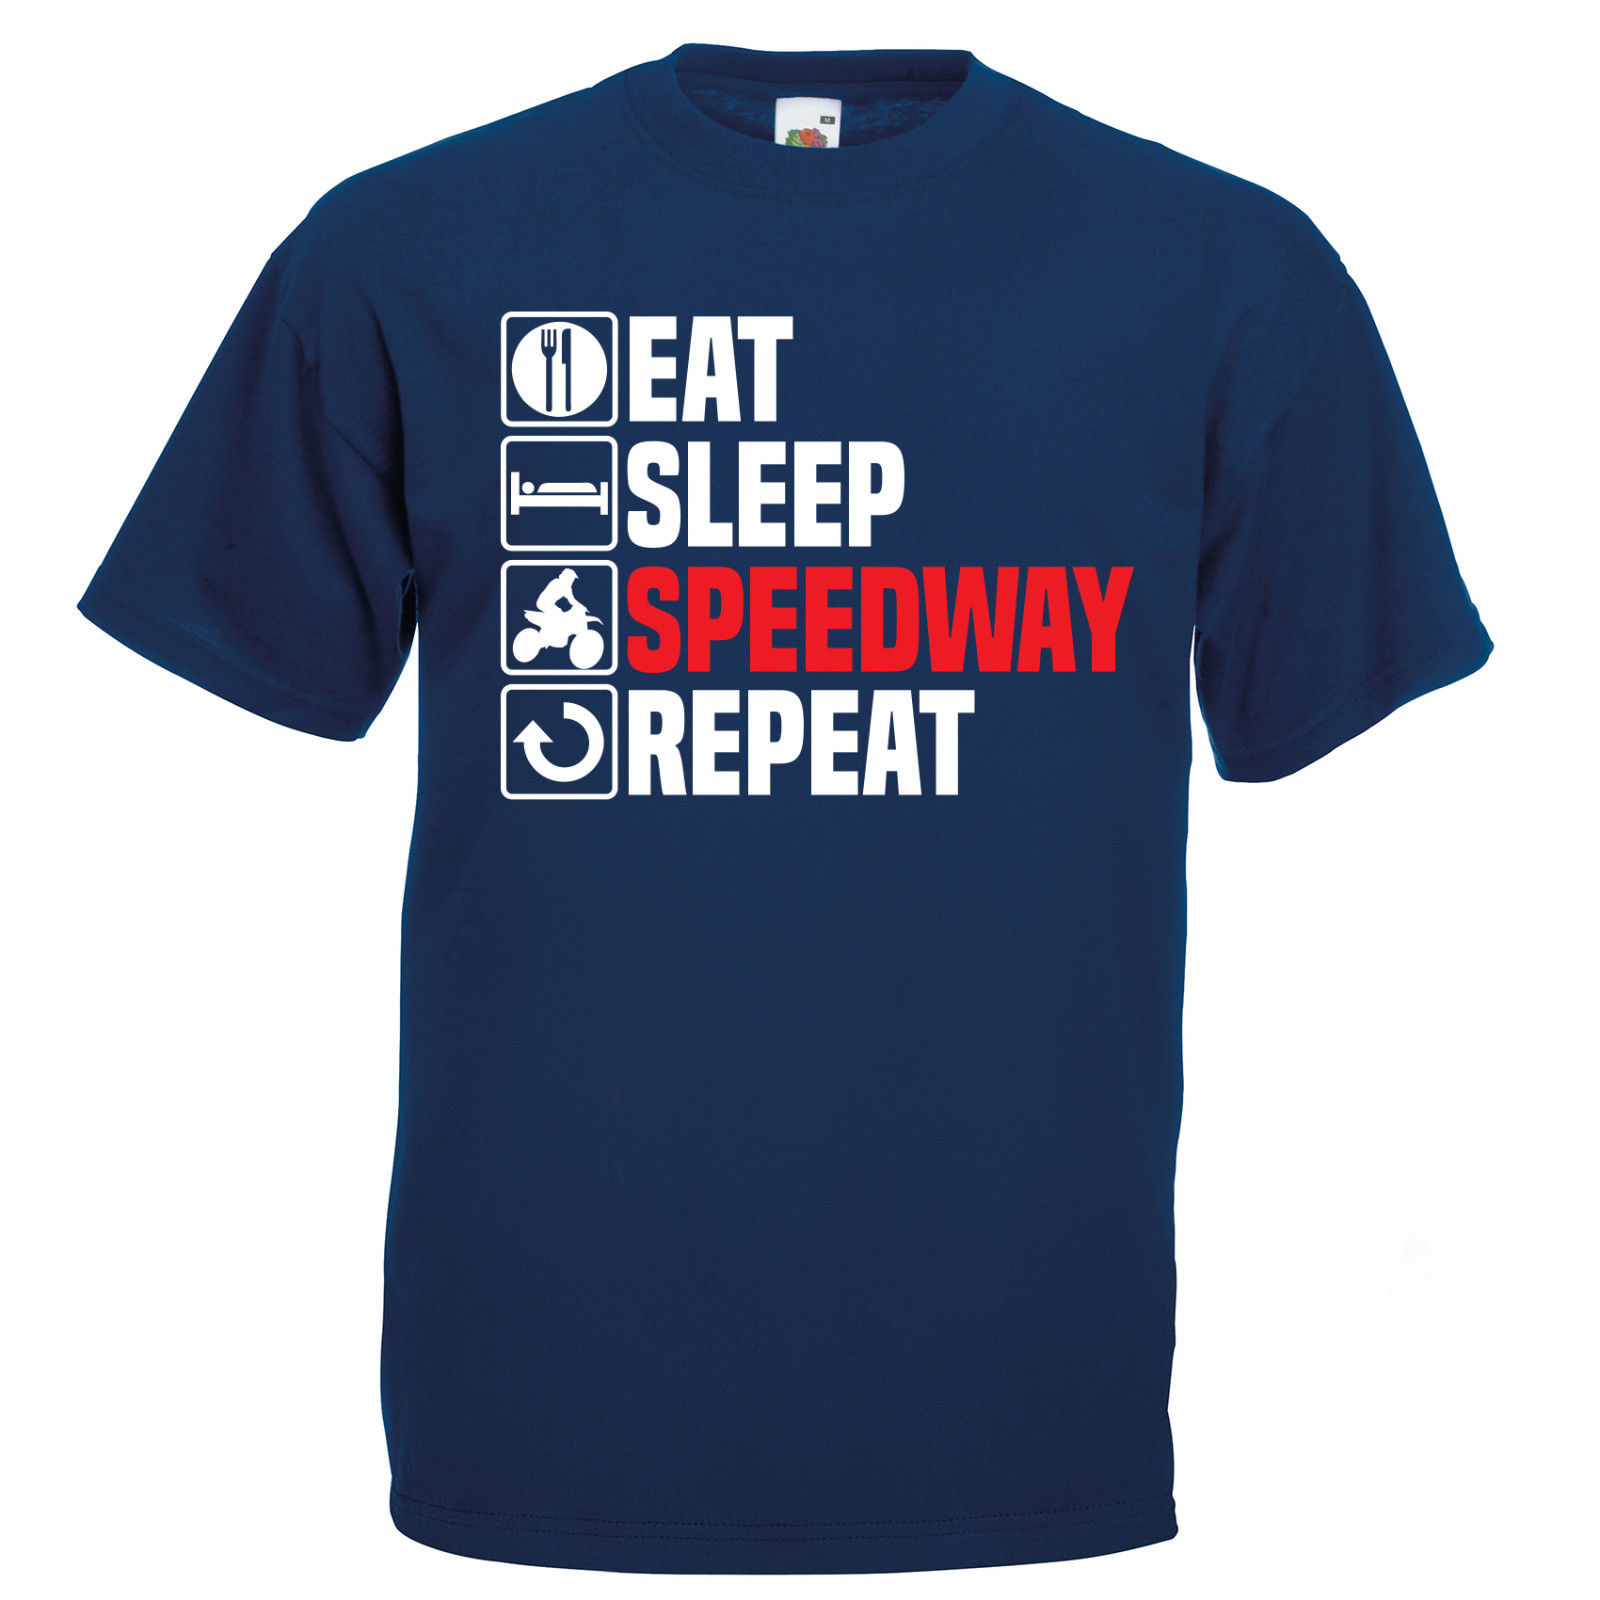 Eat Sleep Speedway T Shirt Biker Motorbike Racinger Fathers Day Birthday Gift 100% Cotton Fashion T-Shirts Top Tee